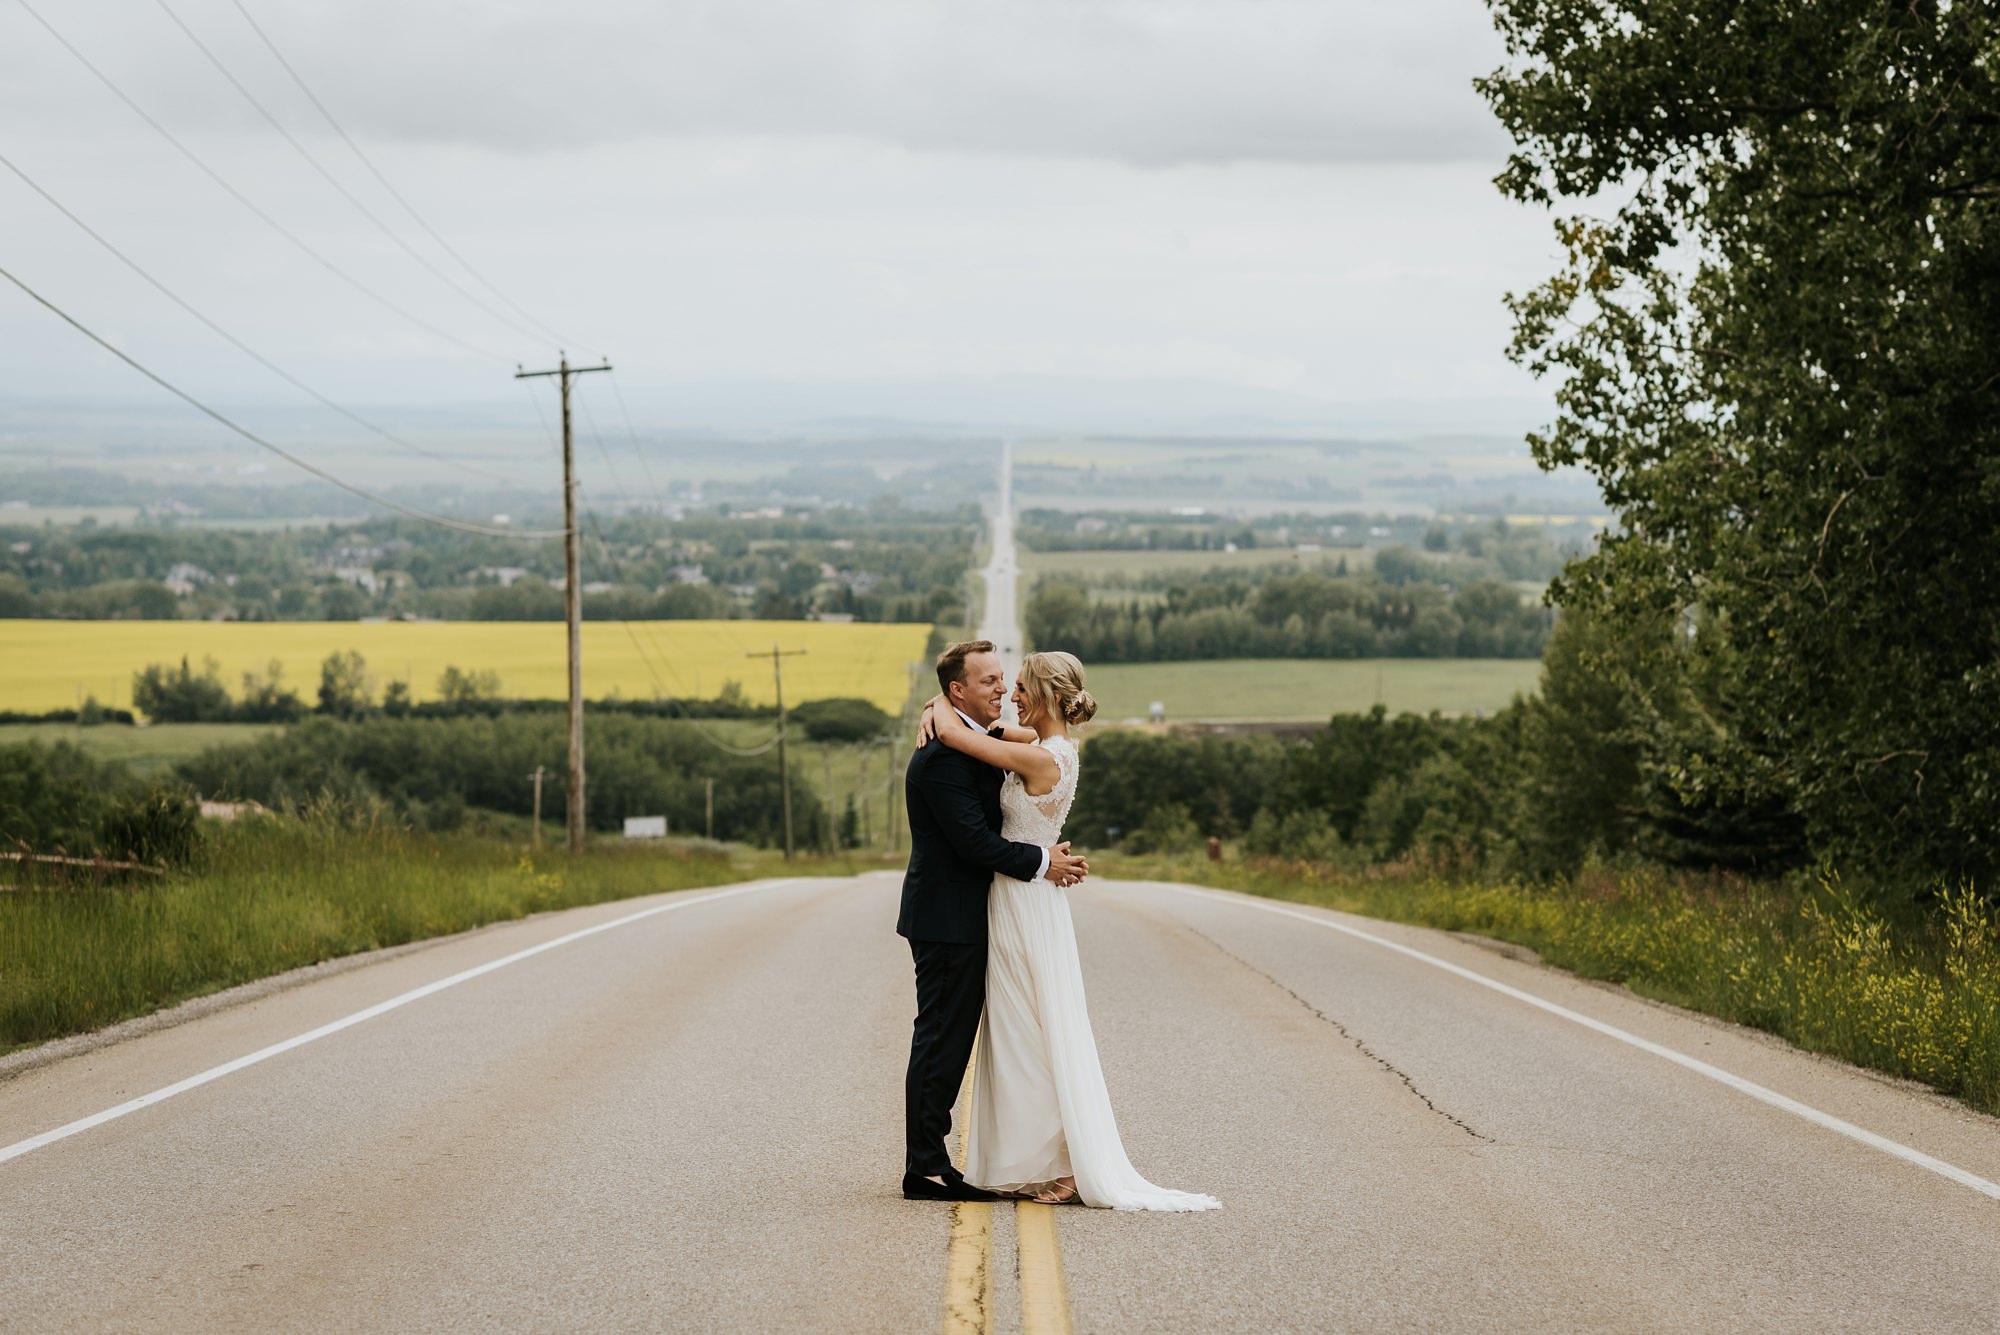 bride and groom embracing in alloy restaurant wedding in calgary